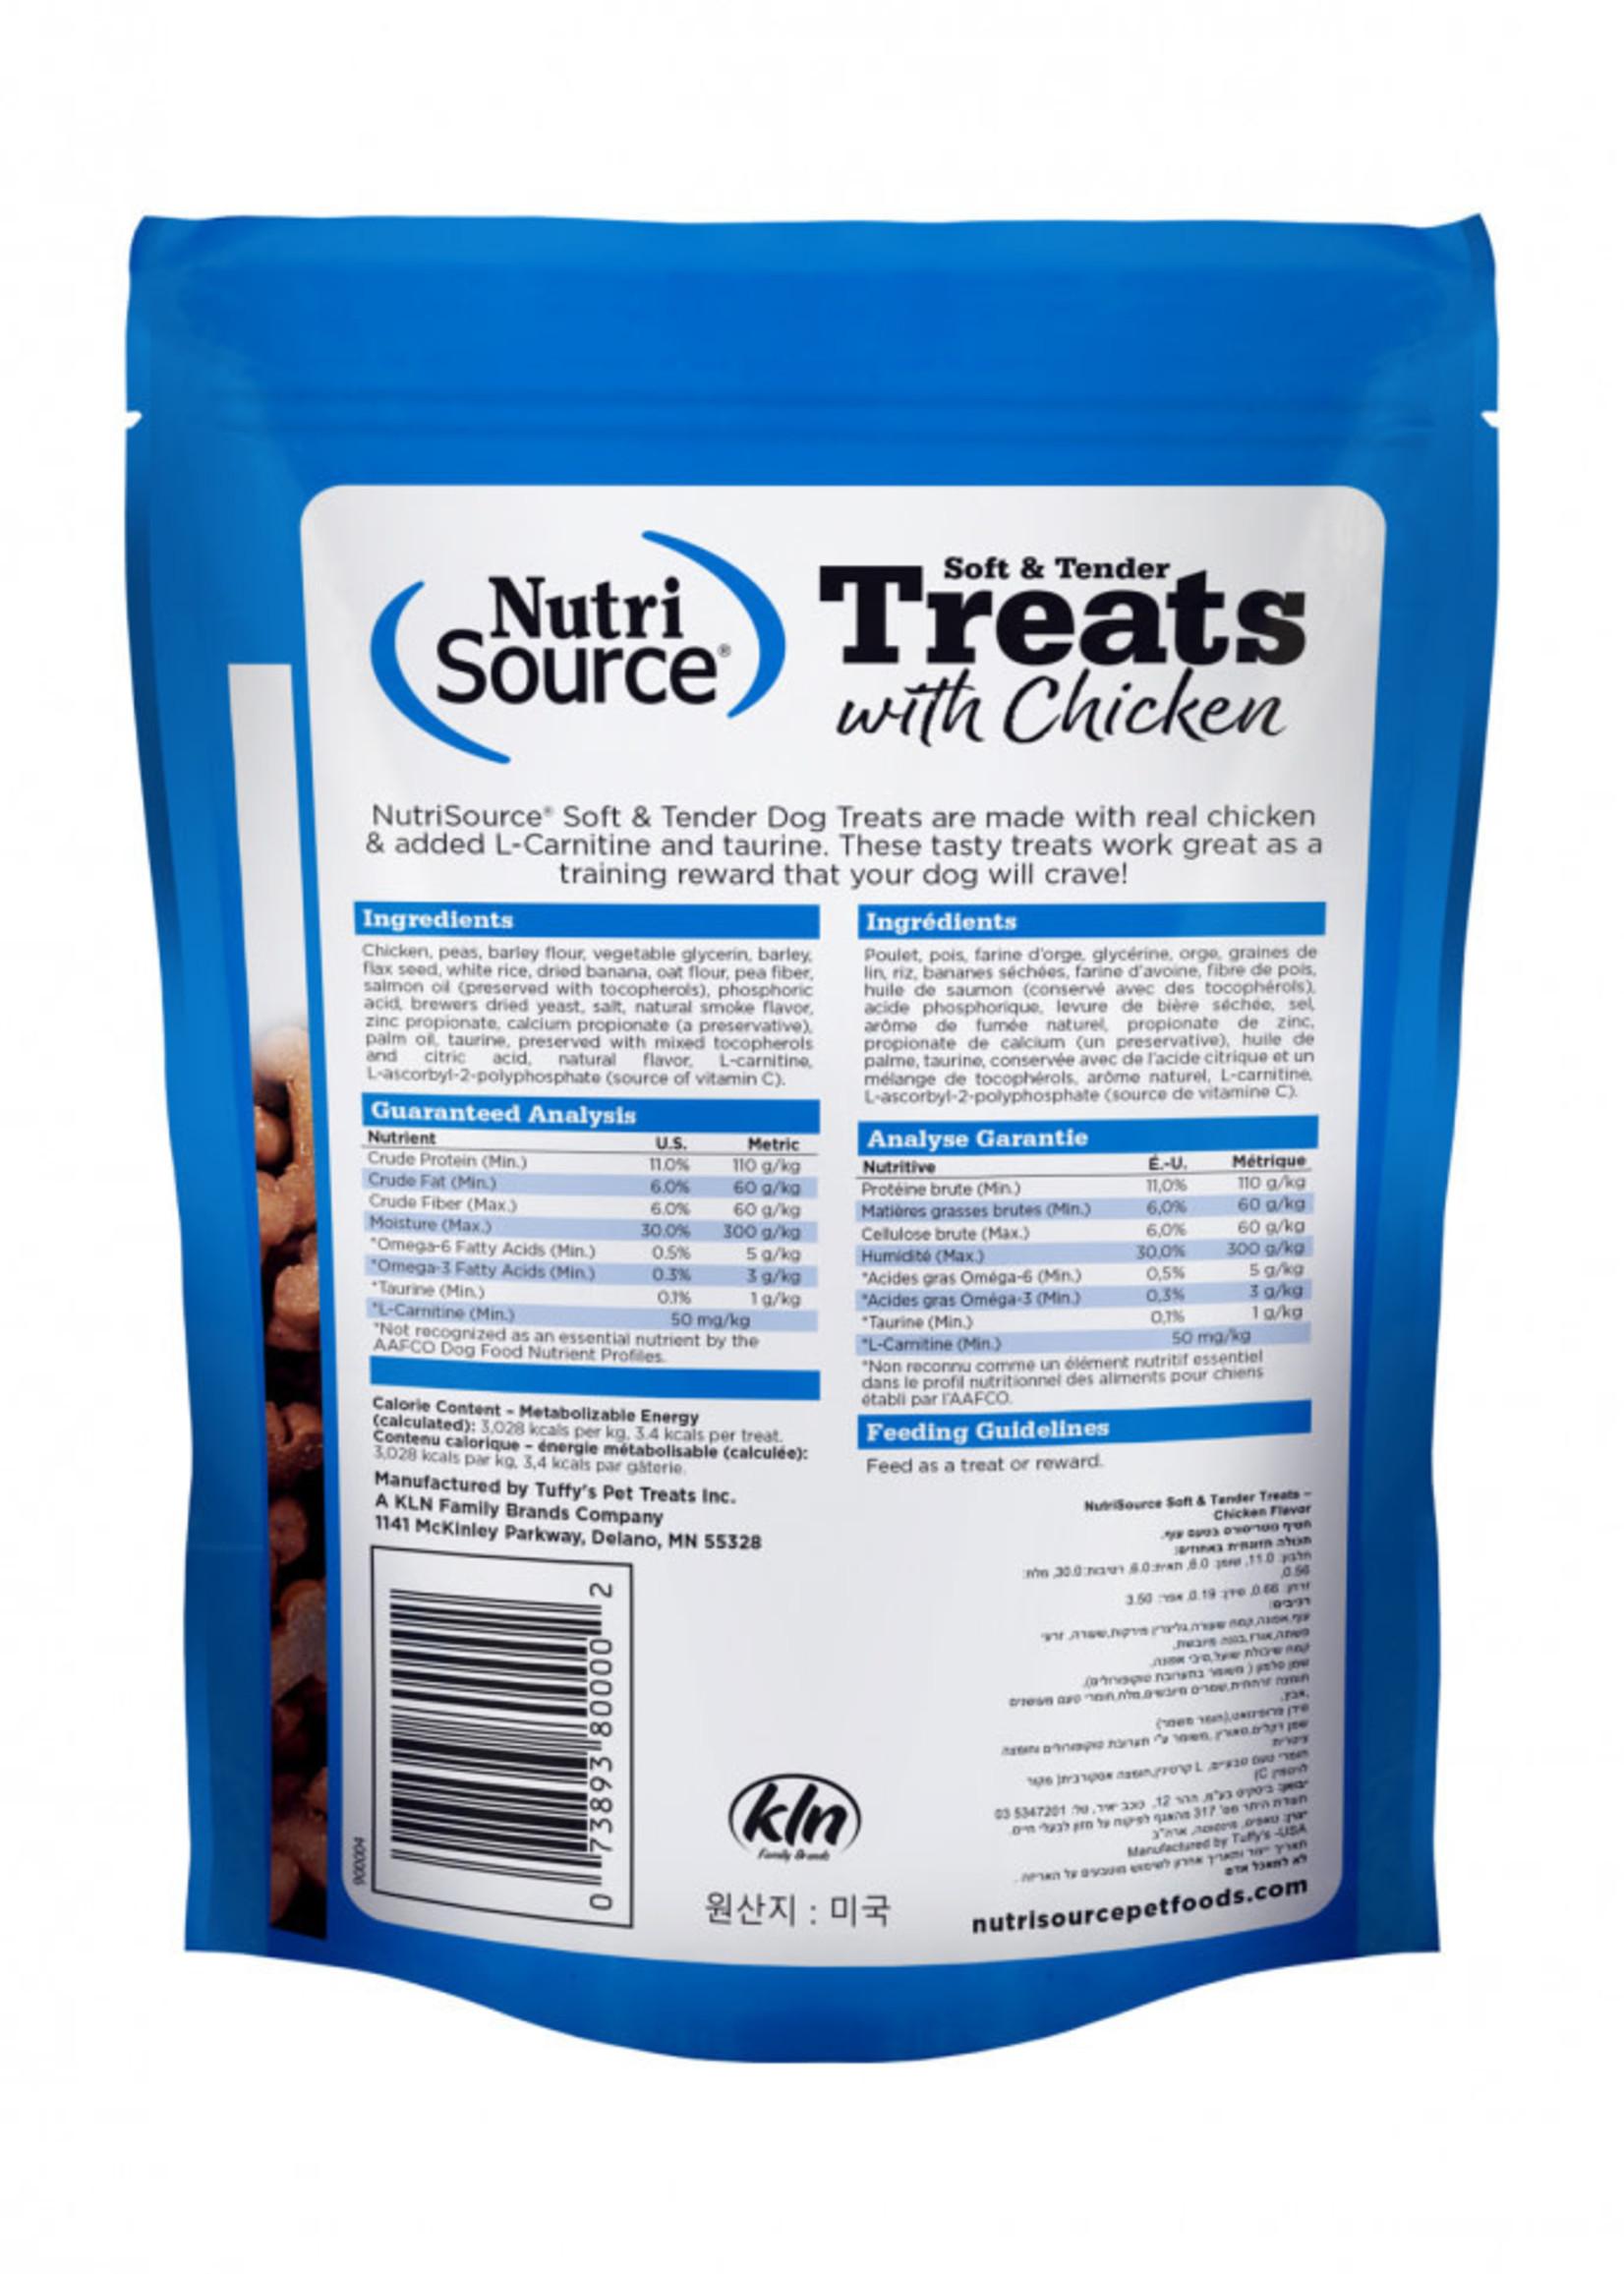 Nutrisource NutriSource Soft & Tender Chicken Treats 14oz